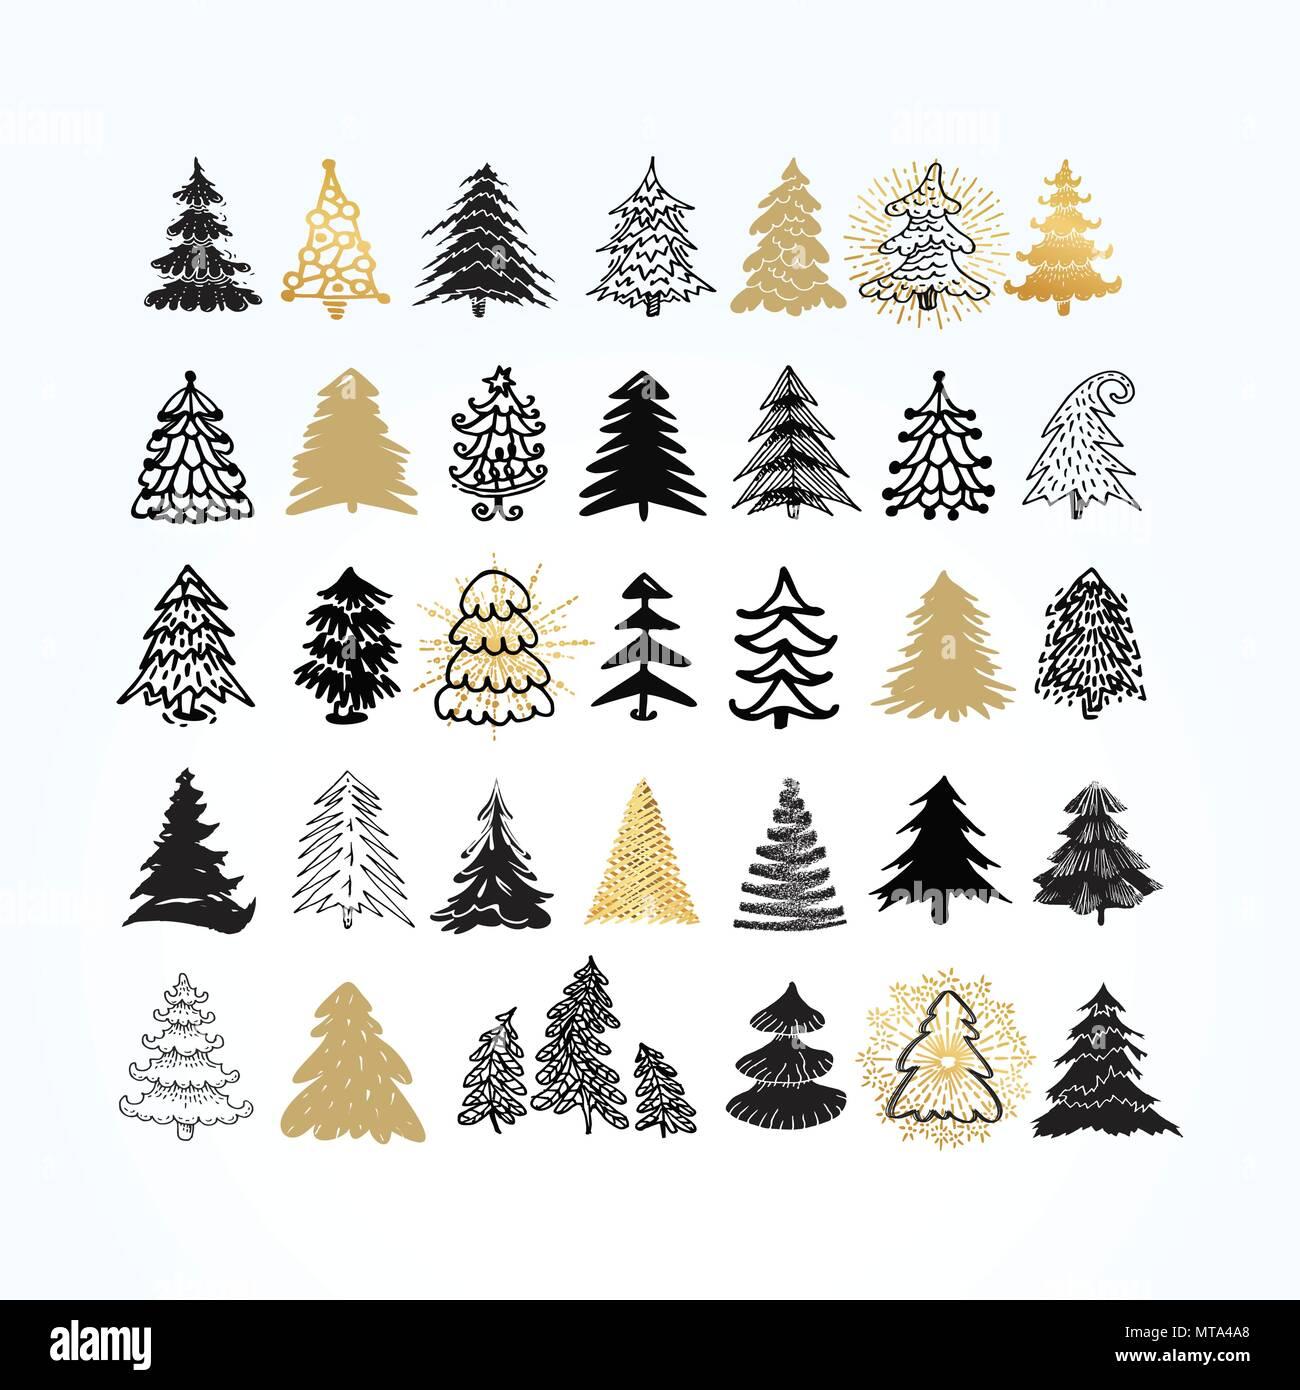 Set Di Diversi Eleganti Alberi Di Natale Elementi Di Disegno